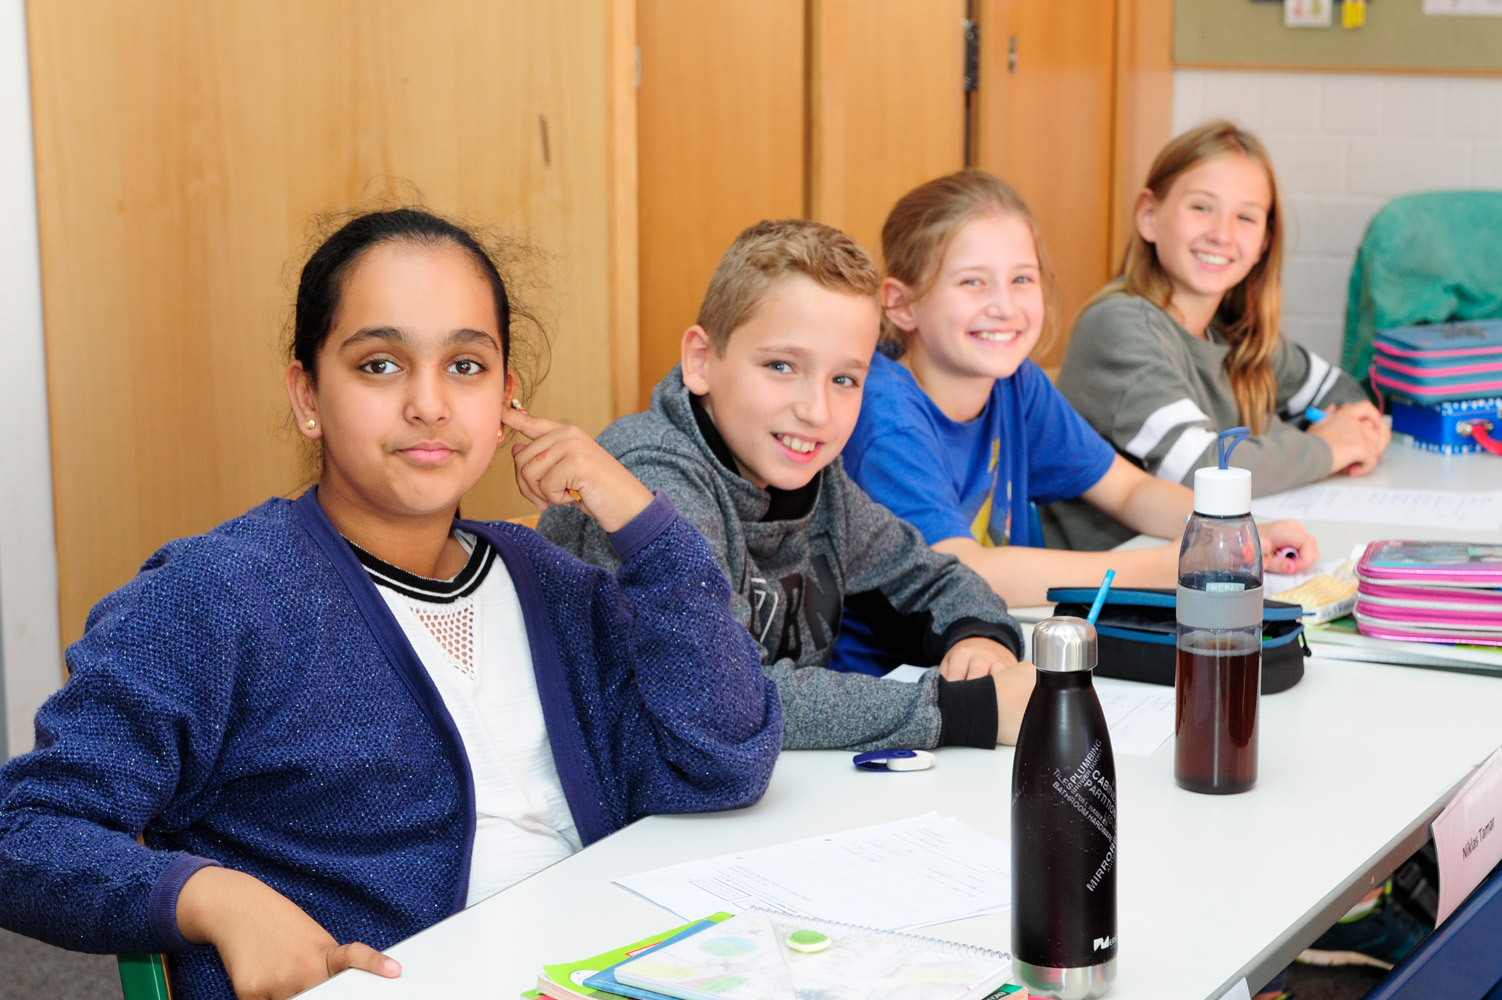 Deutschunterricht an der Erich Kästner Gemeinschaftsschule